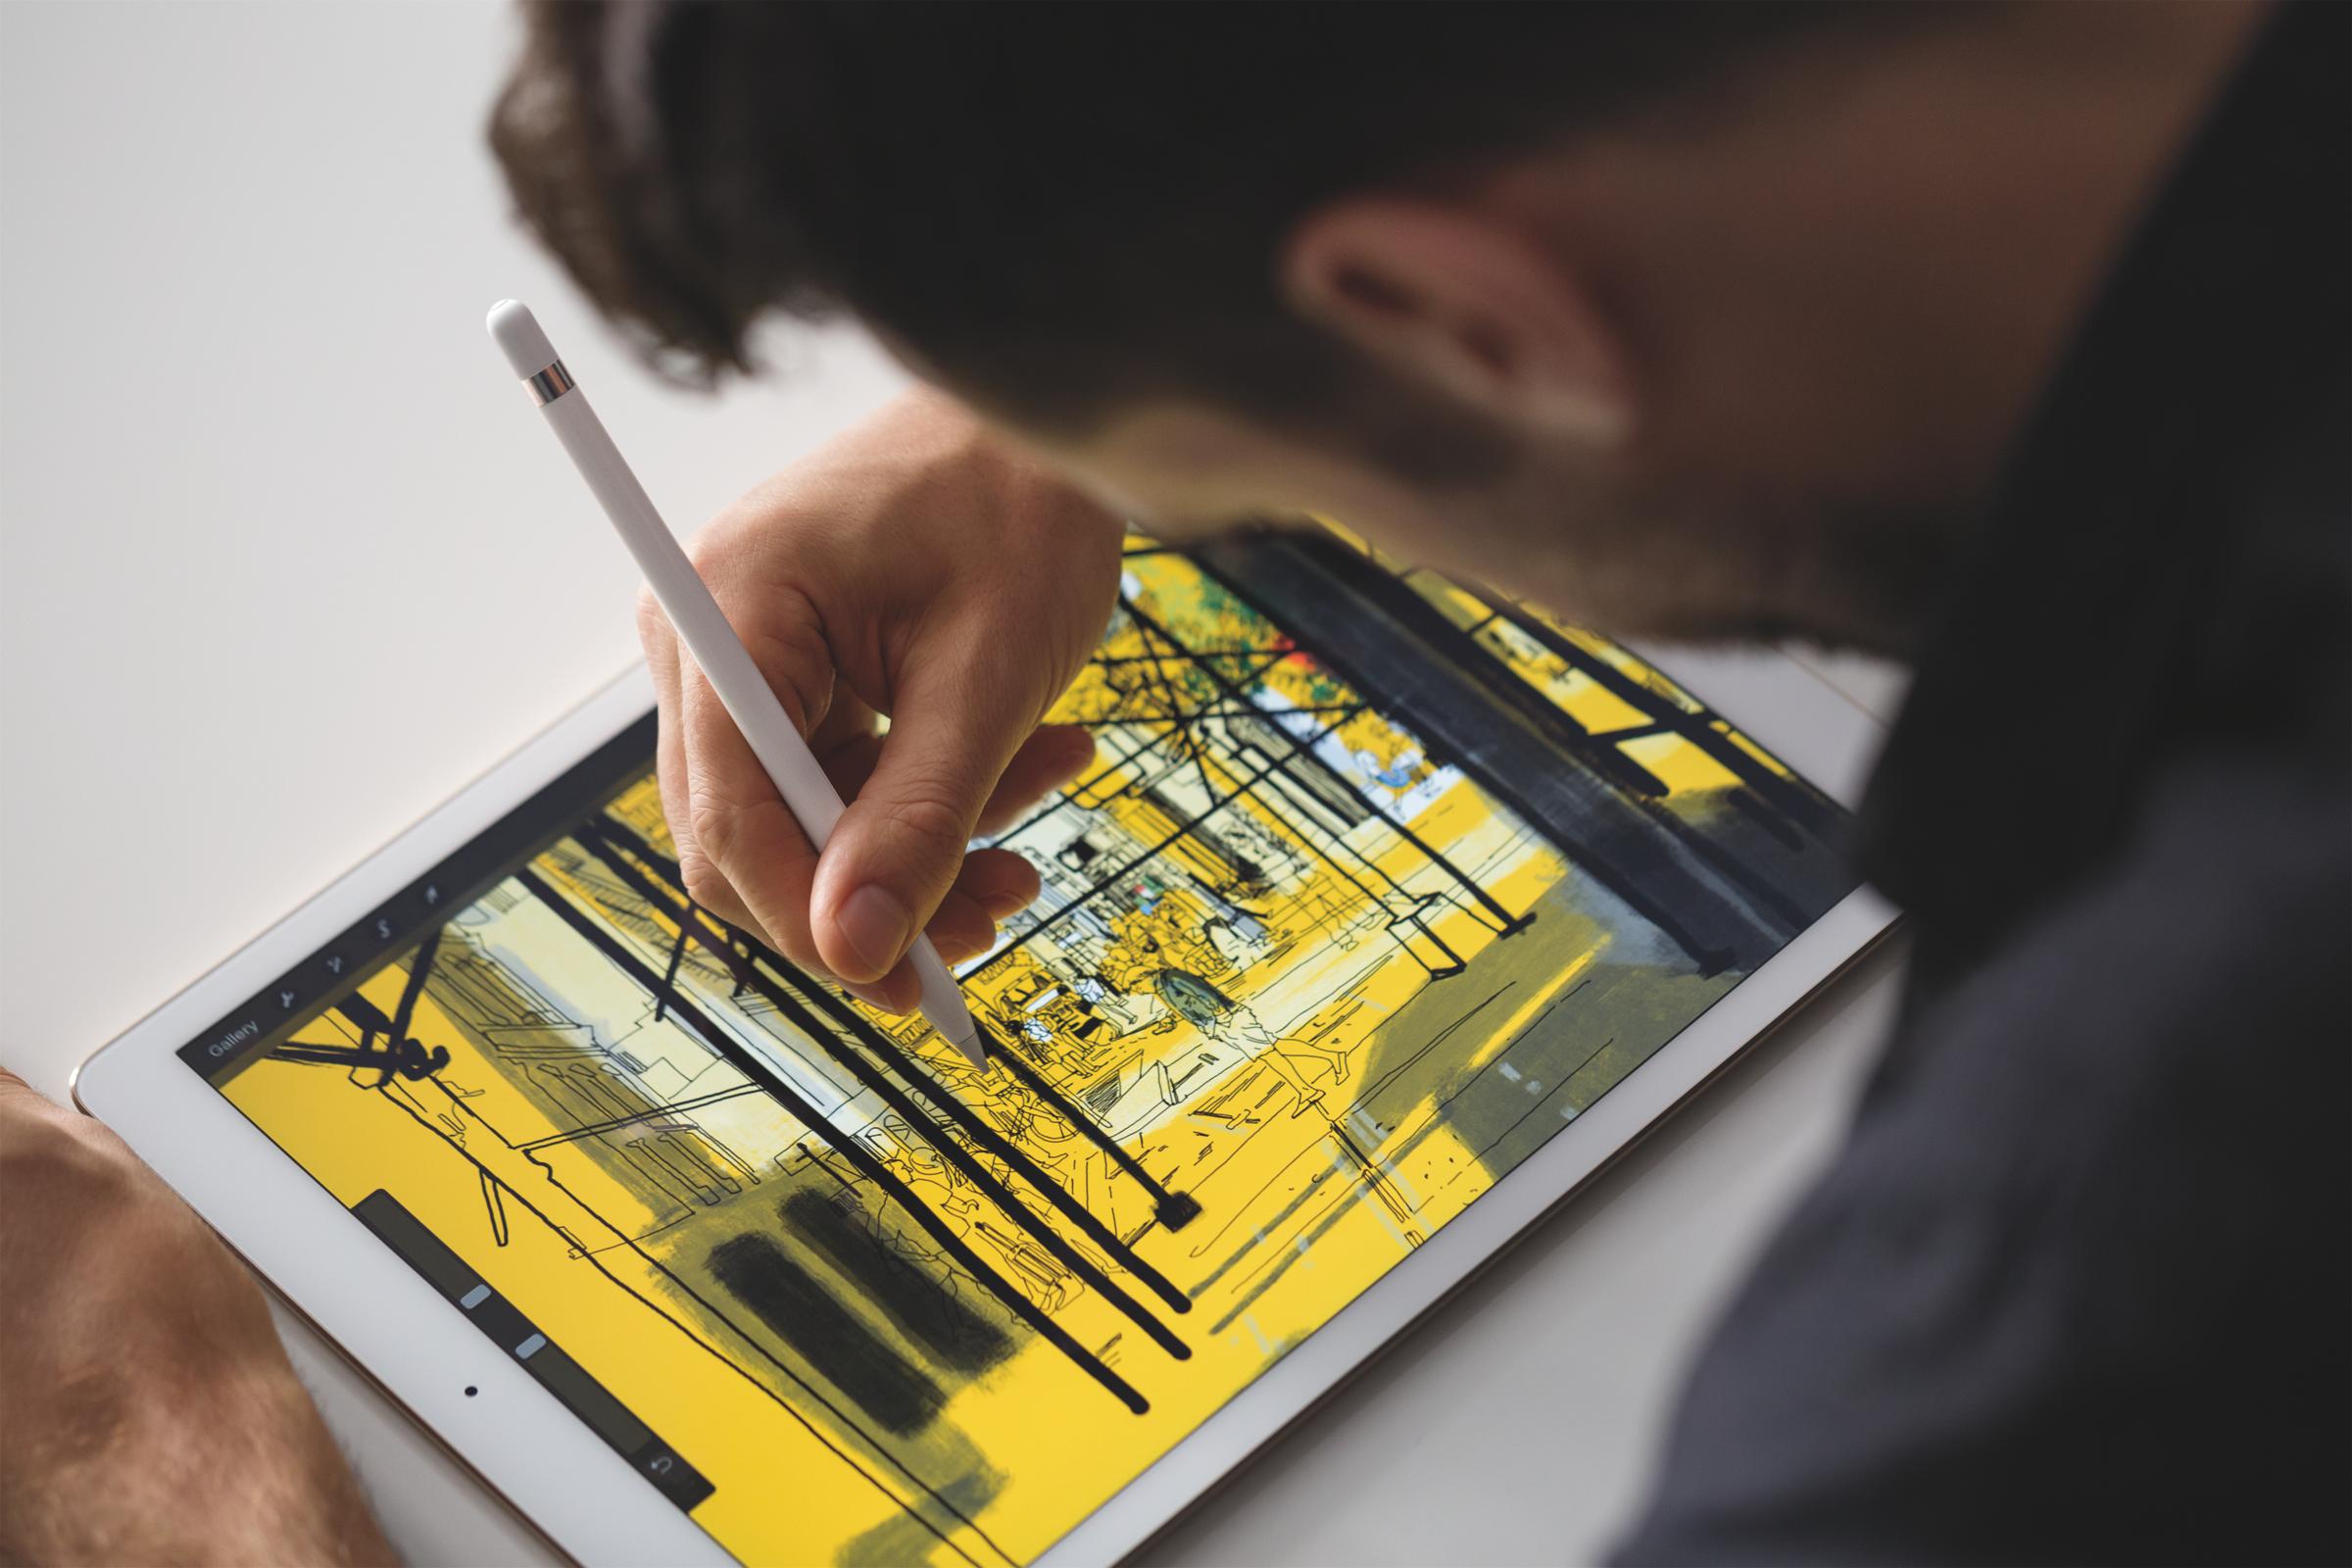 Man using an iPad Pro and Apple Pencil